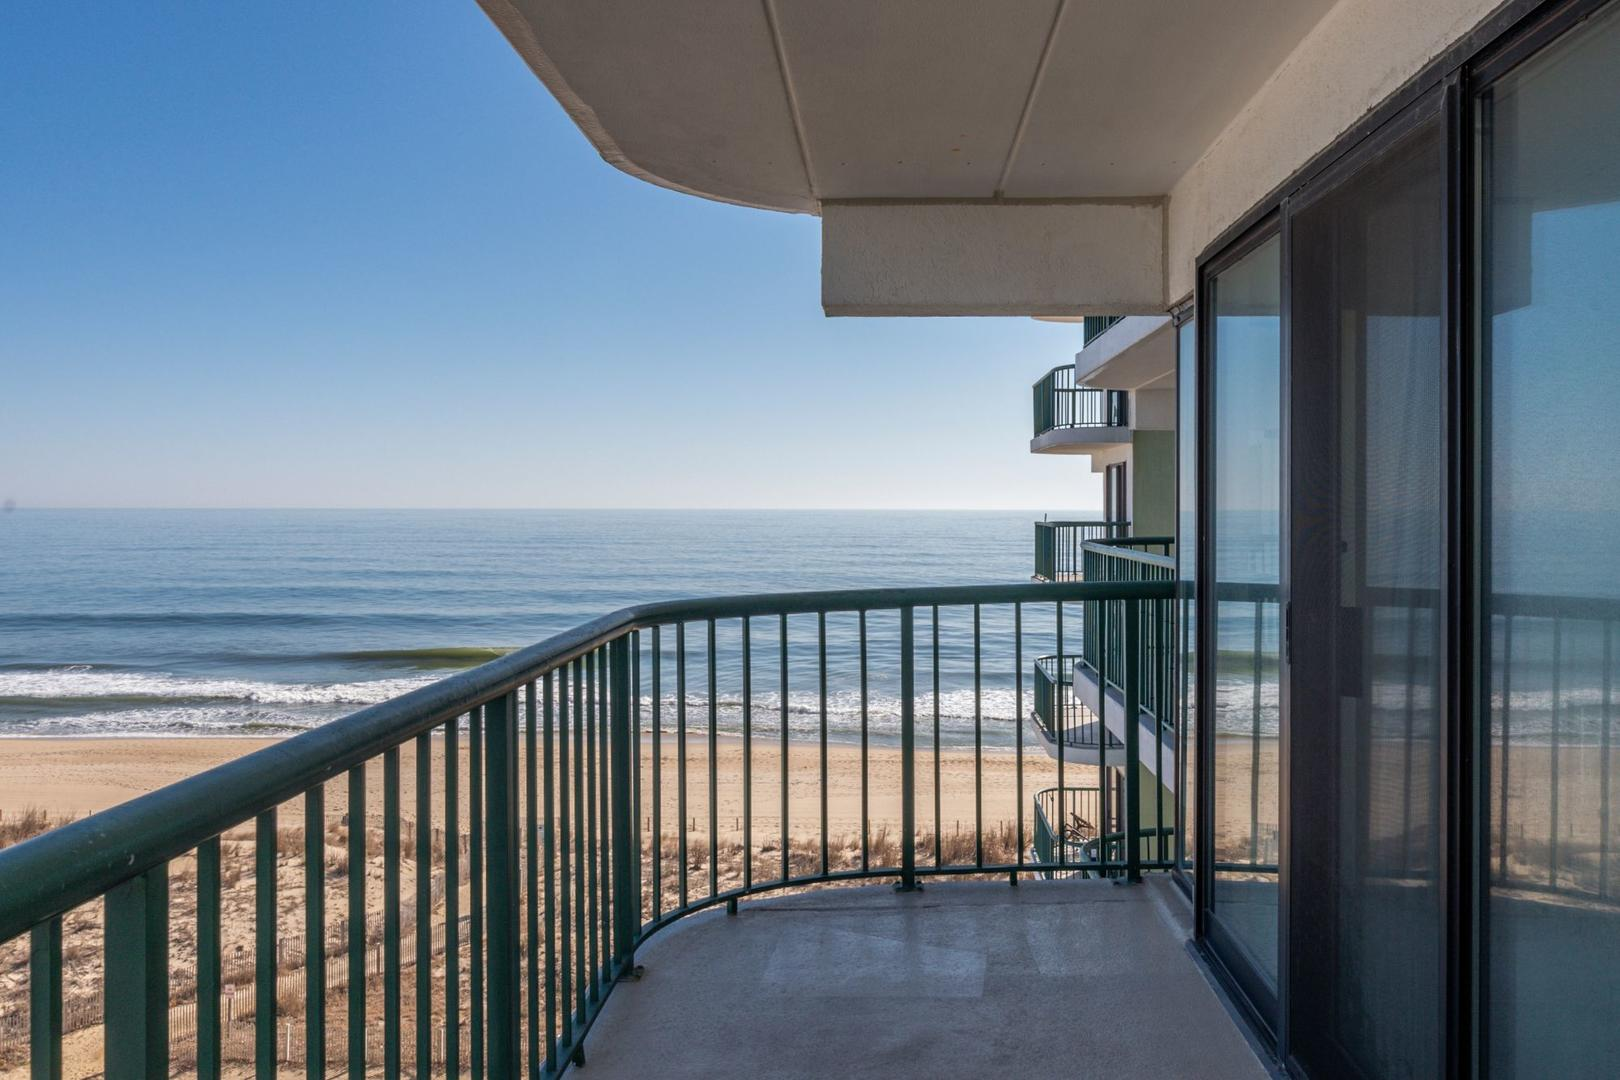 Summer Beach 605 - Private Balcony